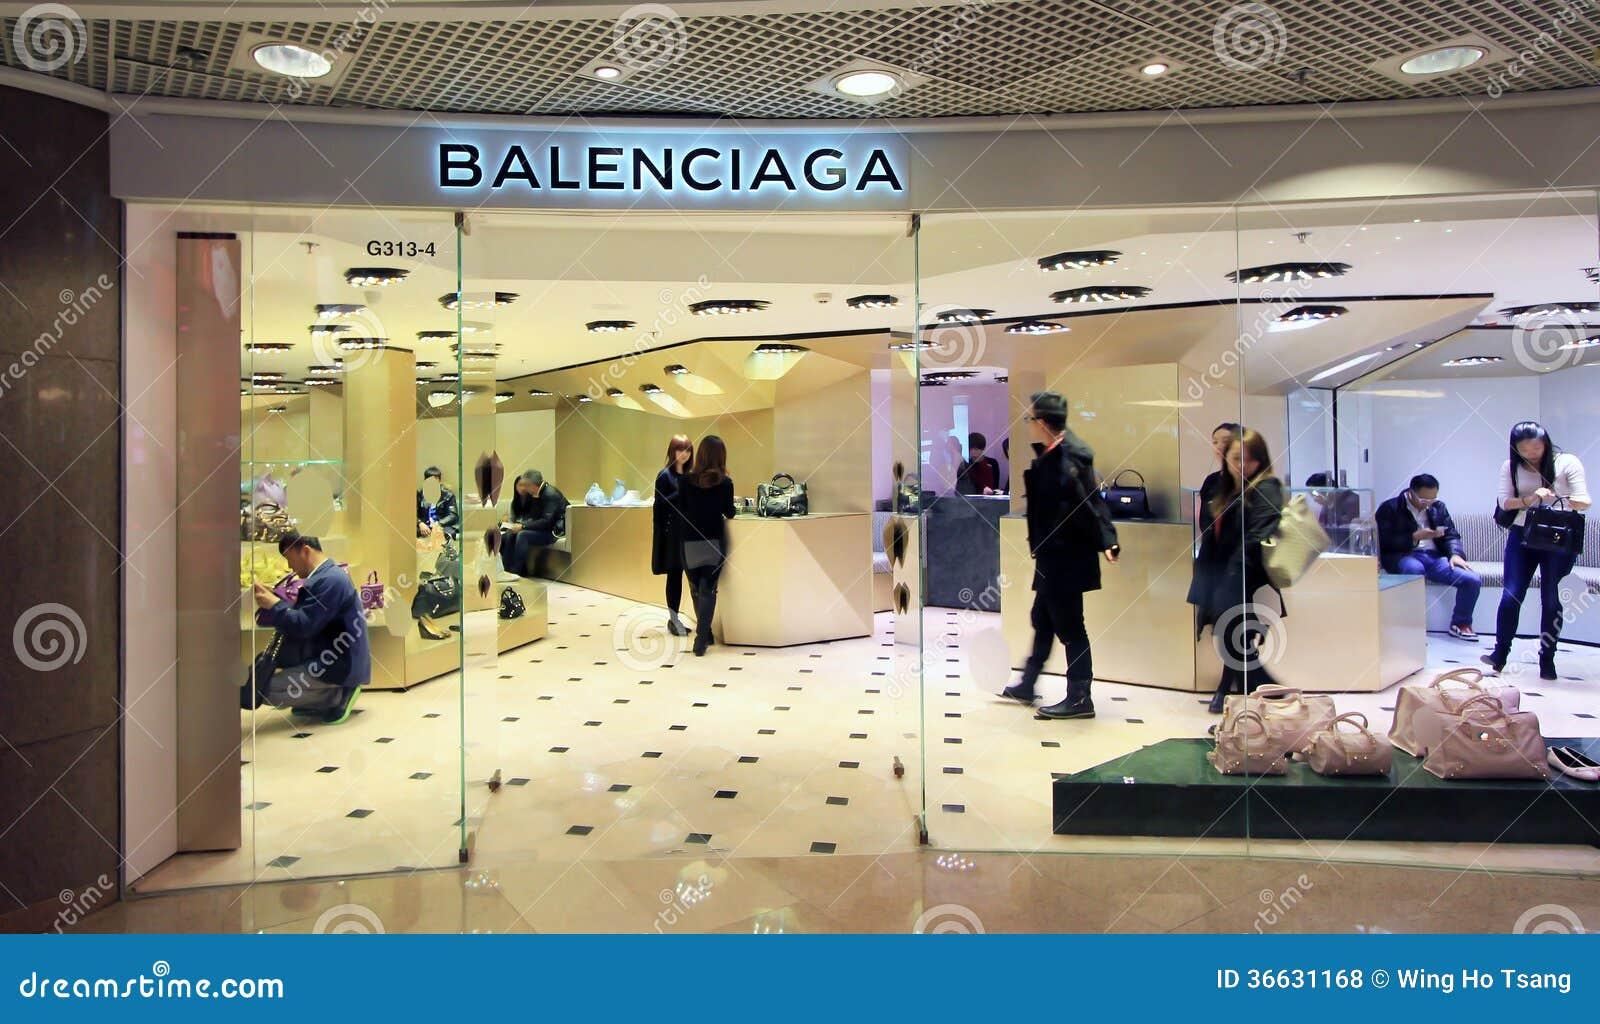 59dd7cdcf Balenciaga Shopper Supermarket